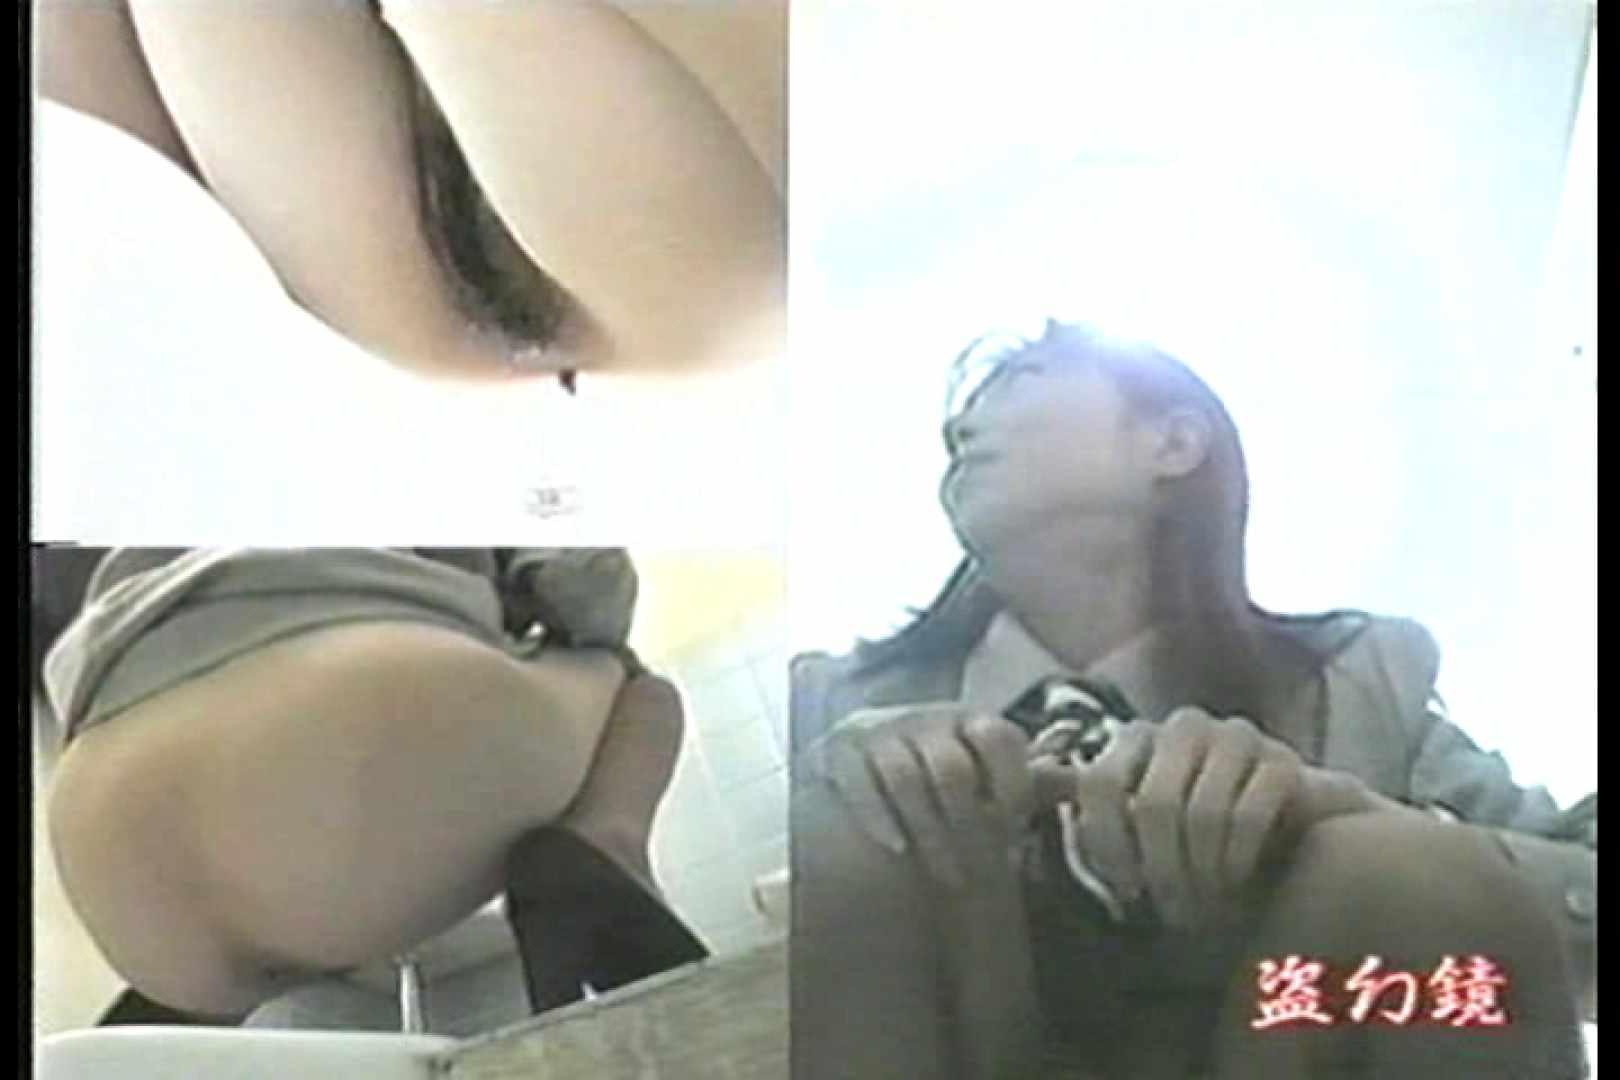 洗面所羞恥美女んMV-2 洗面所 | 排泄生だし  70PIX 66